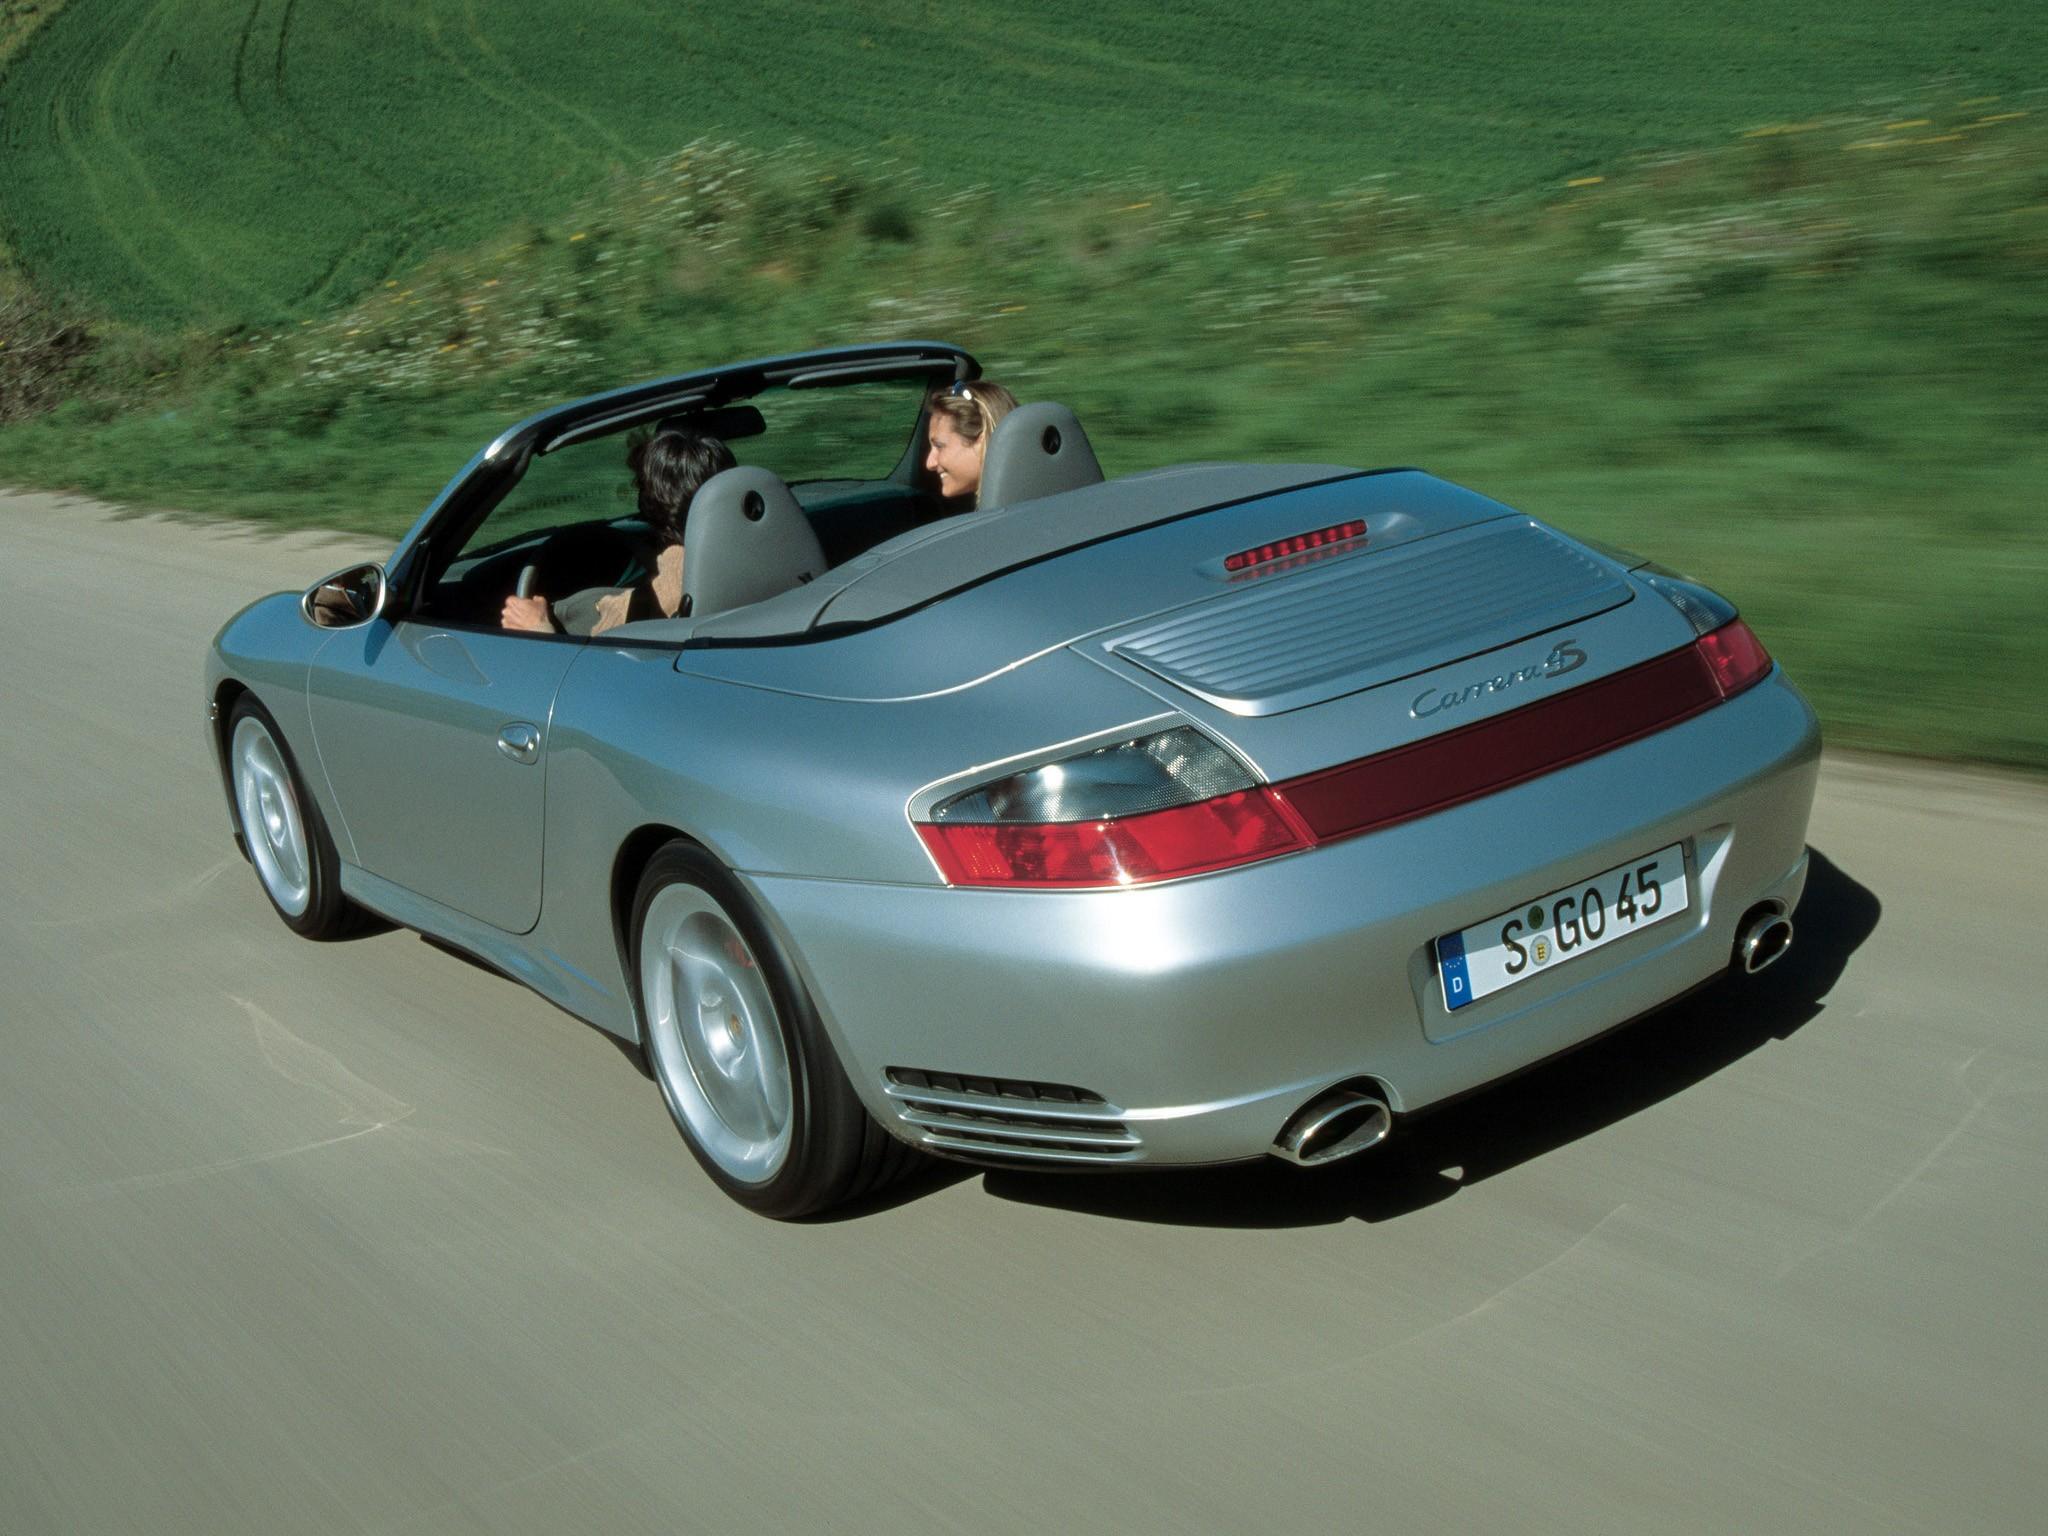 PORSCHE 911 Carrera 4S Cabriolet 996  2003, 2004, 2005